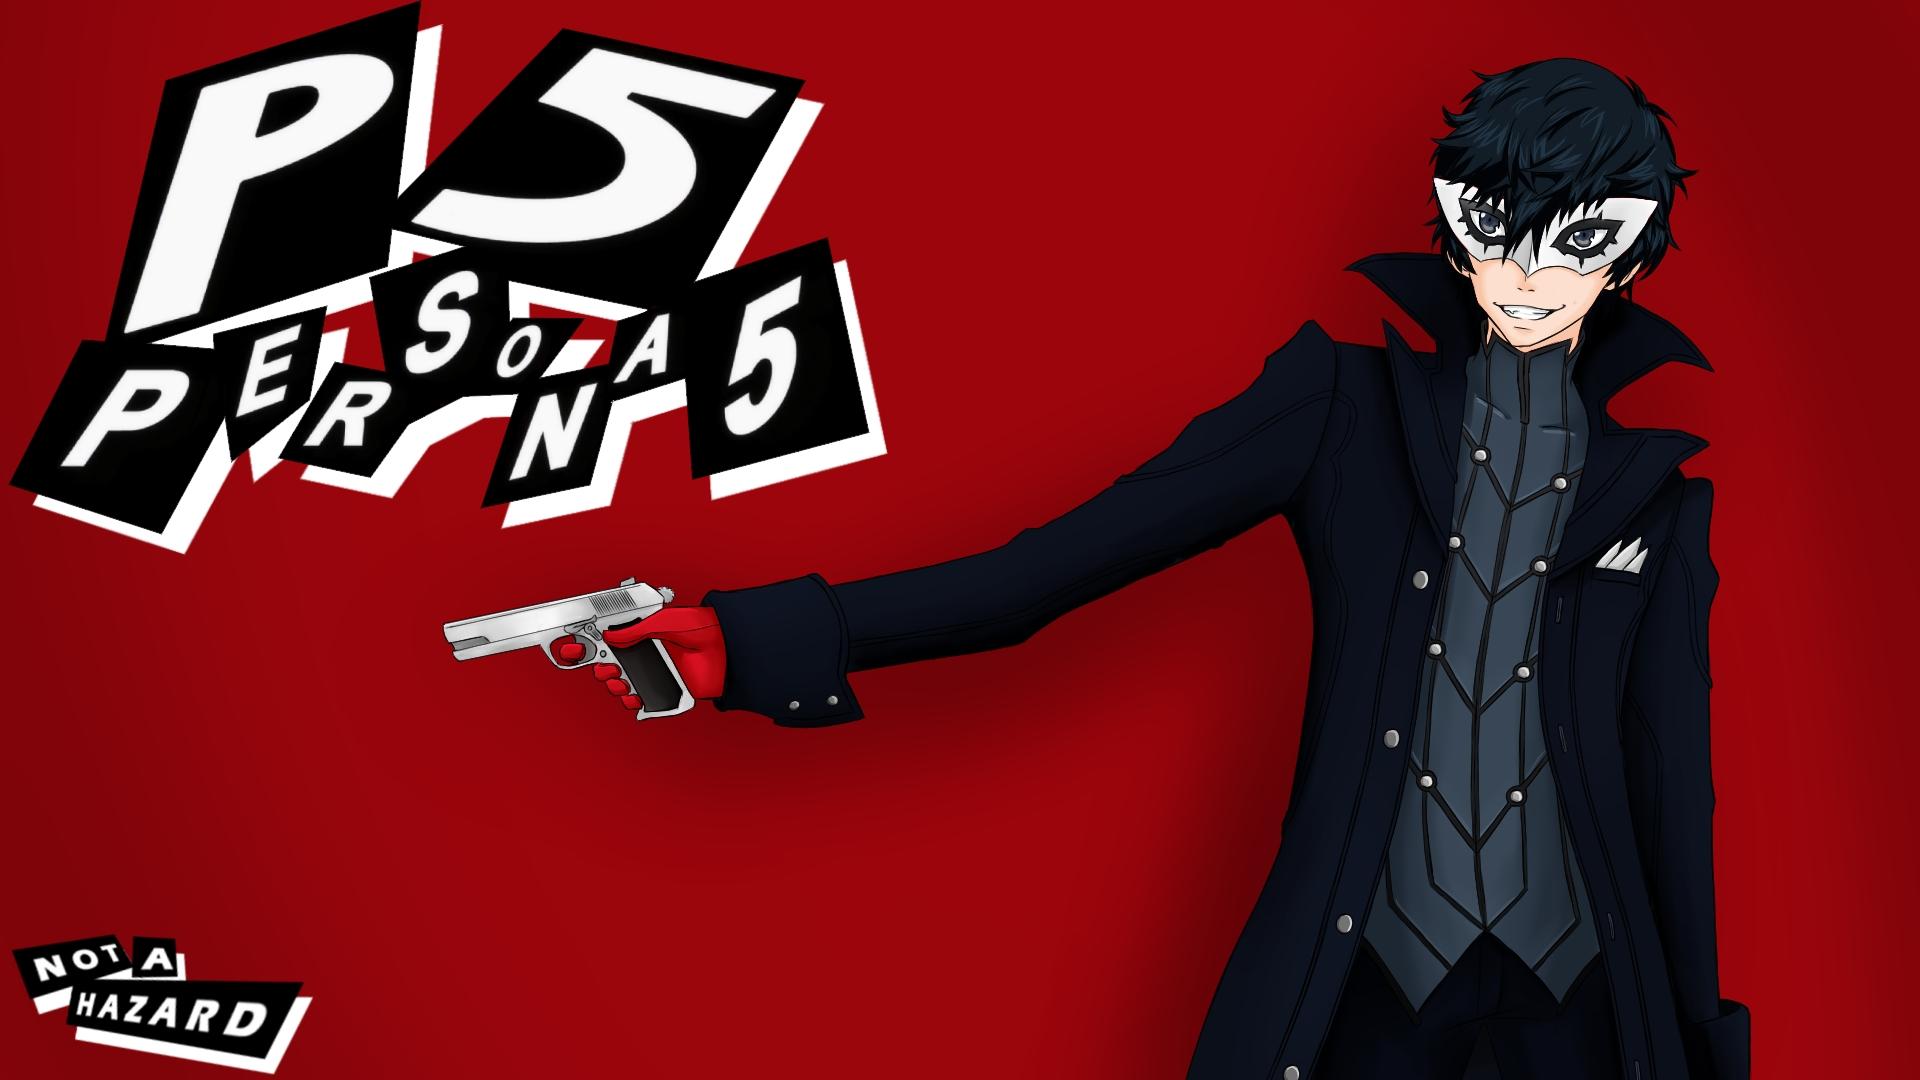 Persona 5 Anime Characters : Protagonist persona zerochan